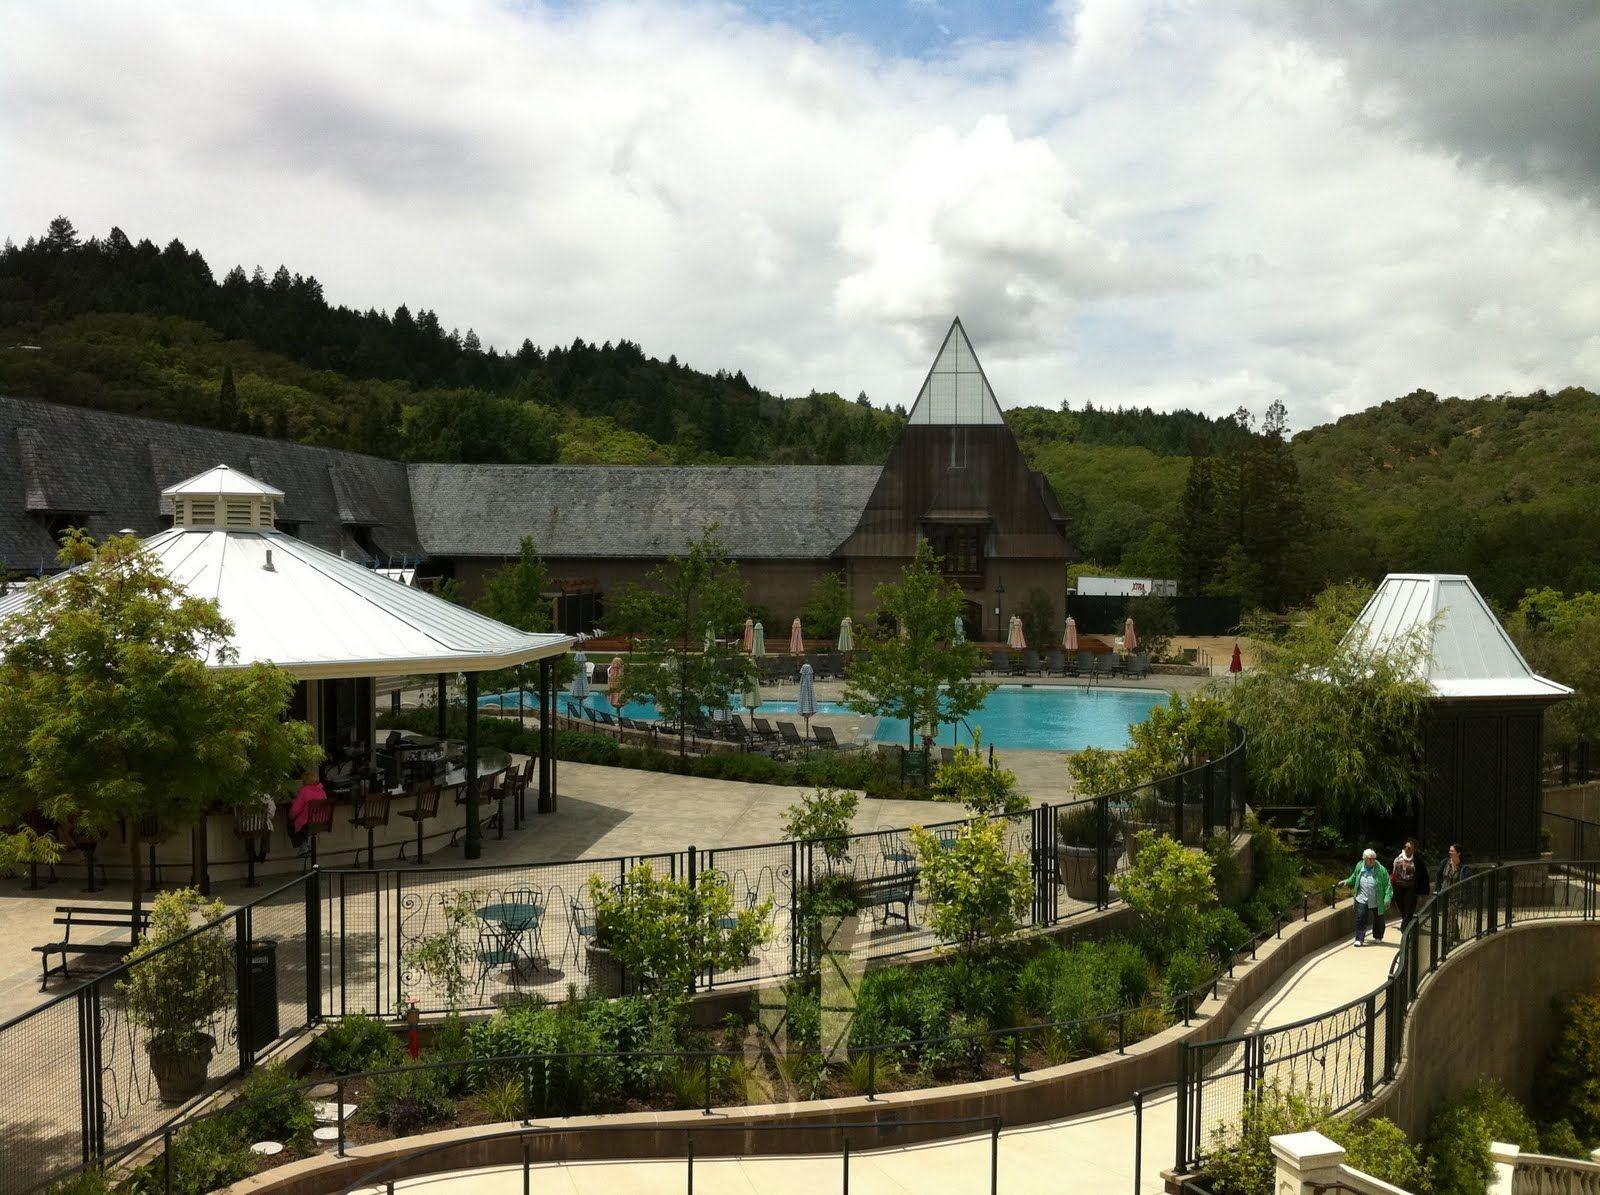 Coppola a big 'ol Napastyle winery in Sonoma. Pool